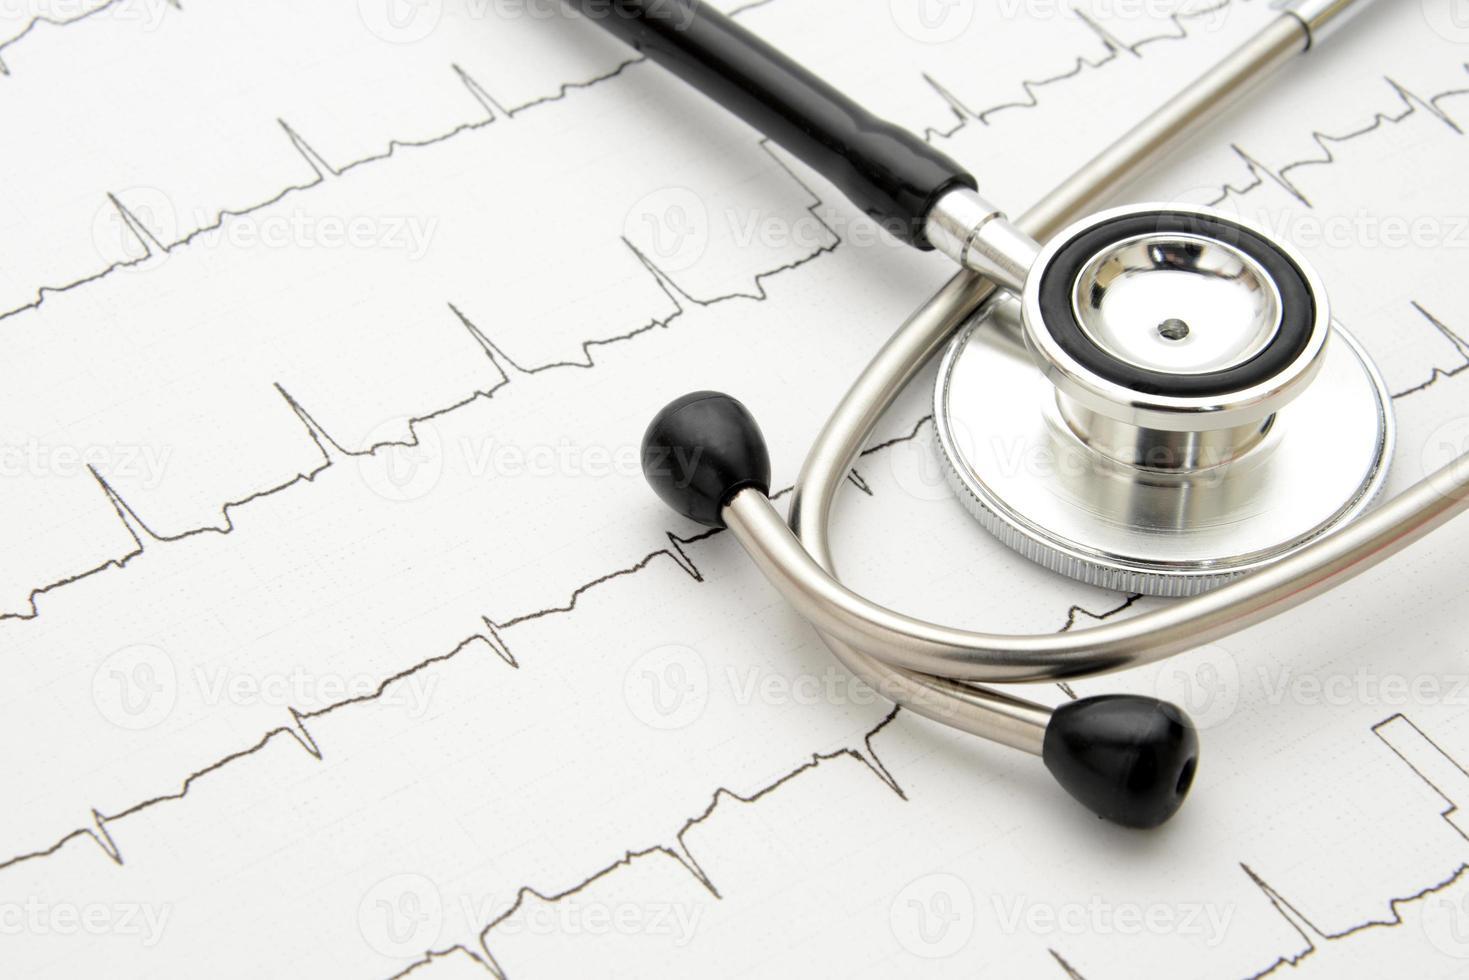 estetoscopio en electrocardiograma foto